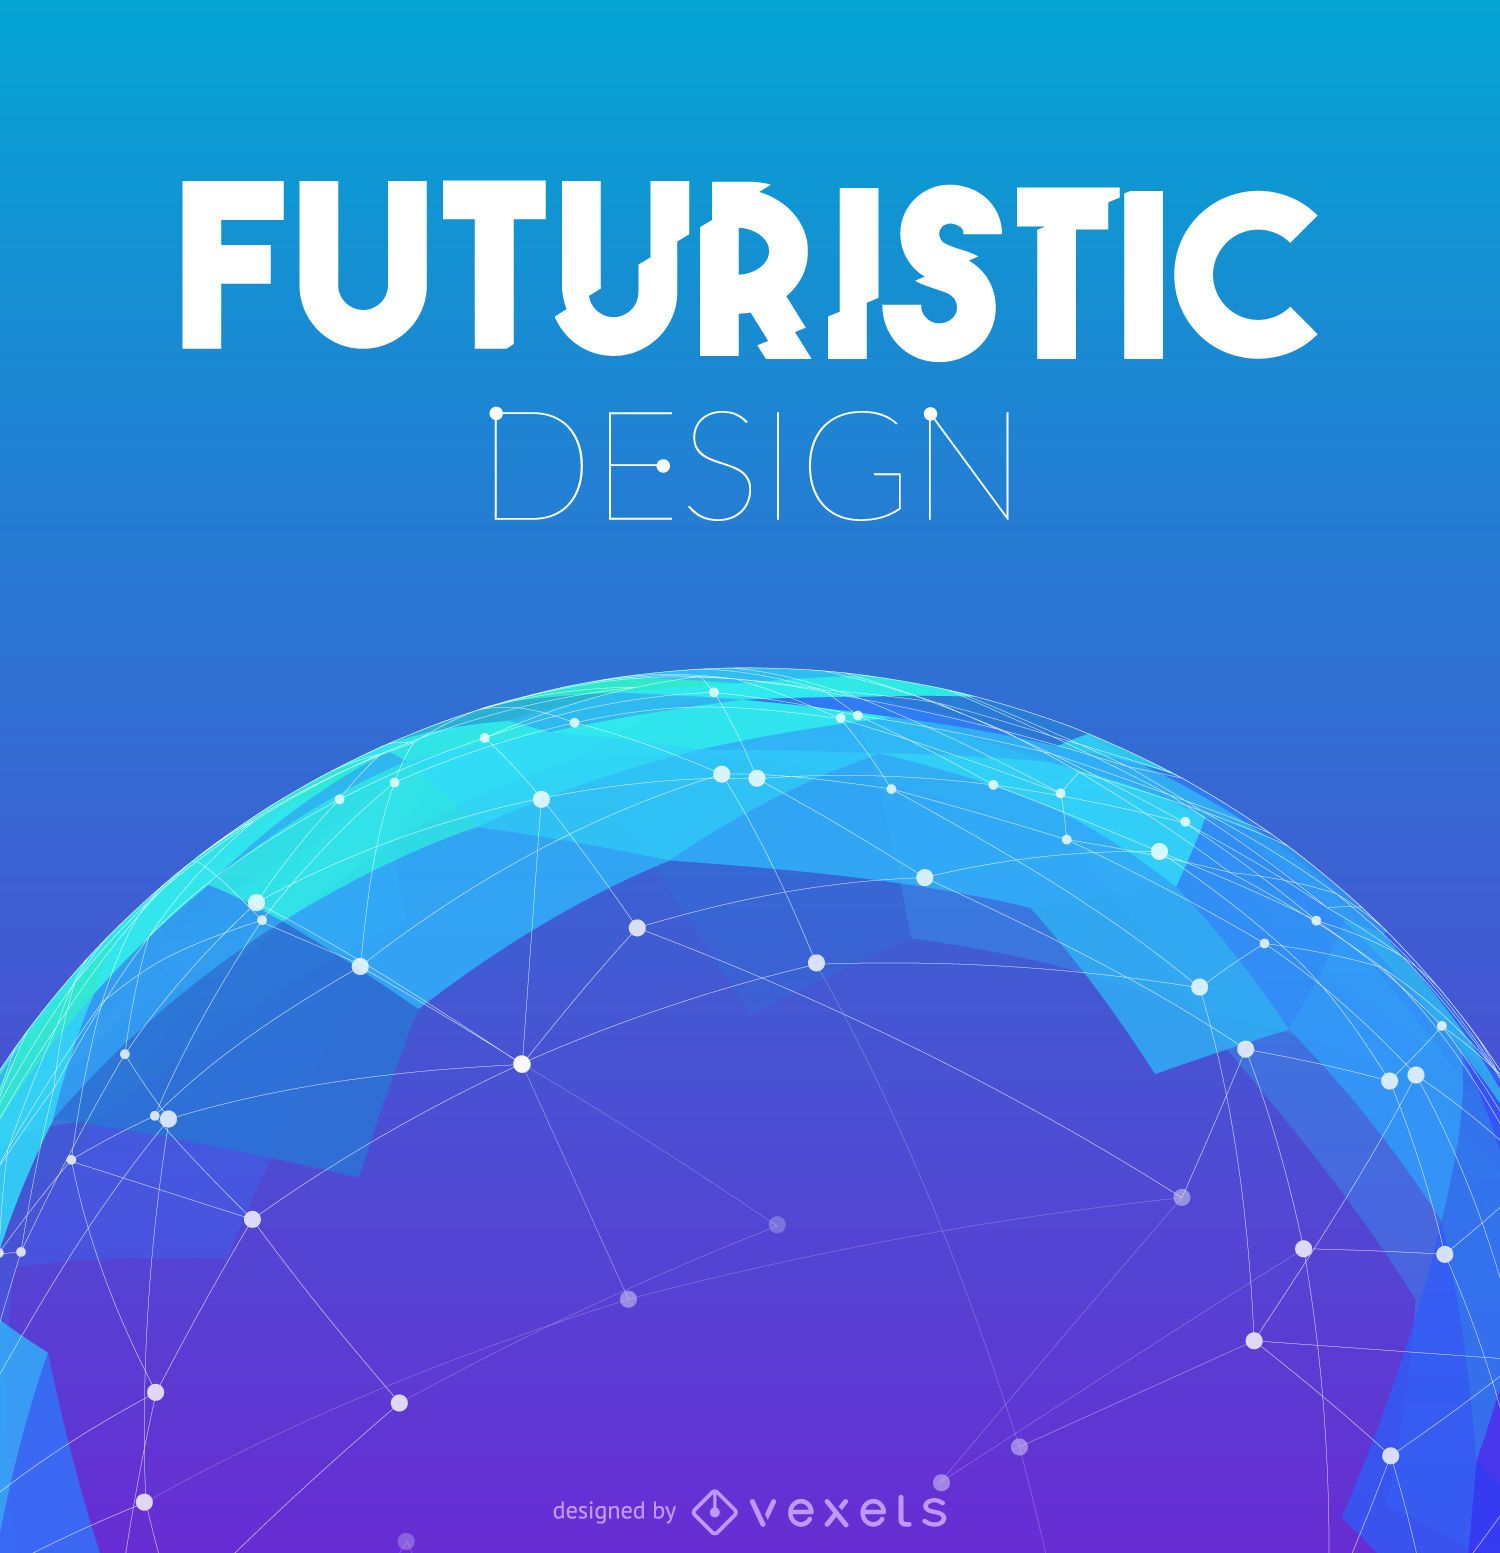 Futuristic mesh design background